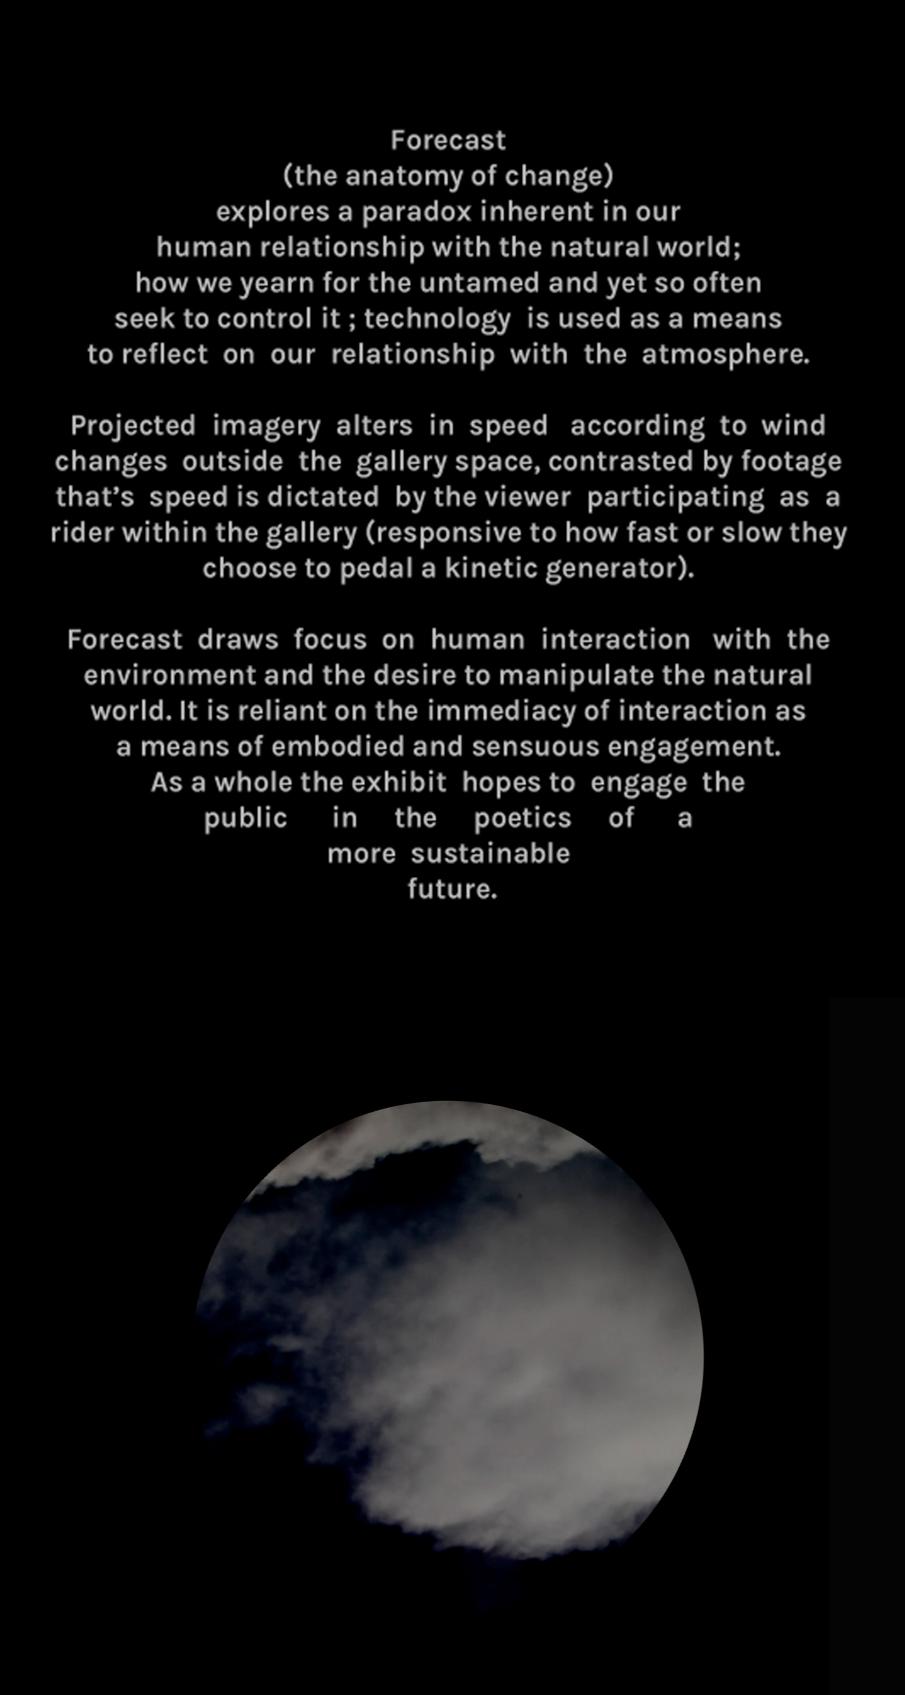 forecast (the anatomy of change) - Selena de Carvalho